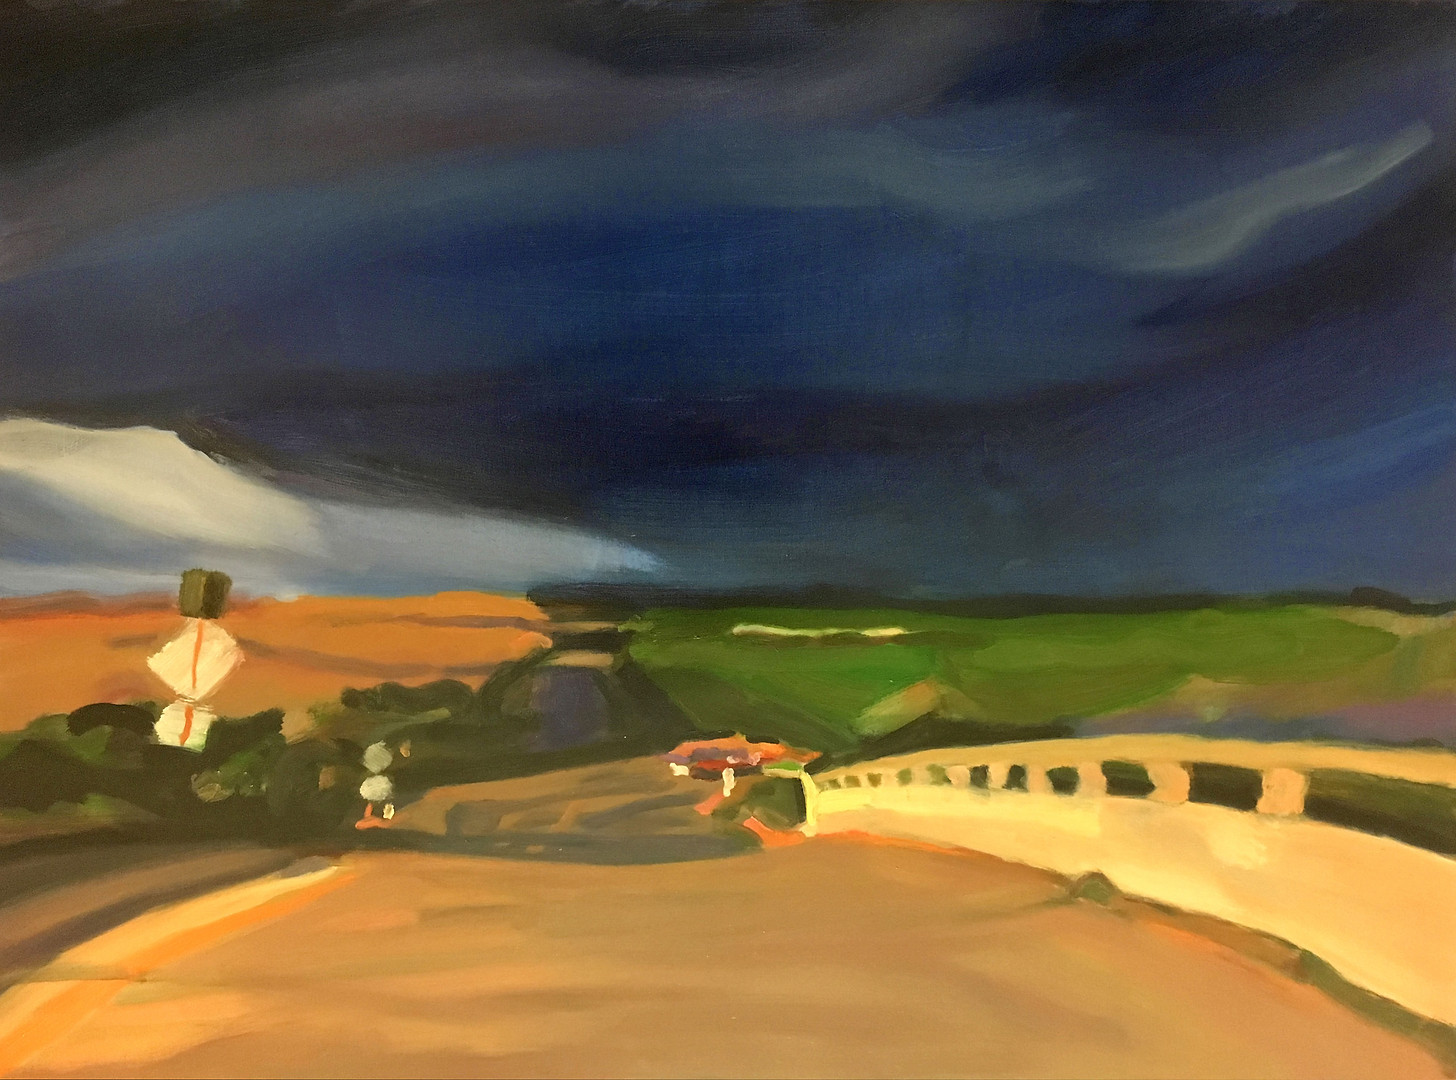 """Western Landscape #7"" Oil/Canvas 36x48 in."